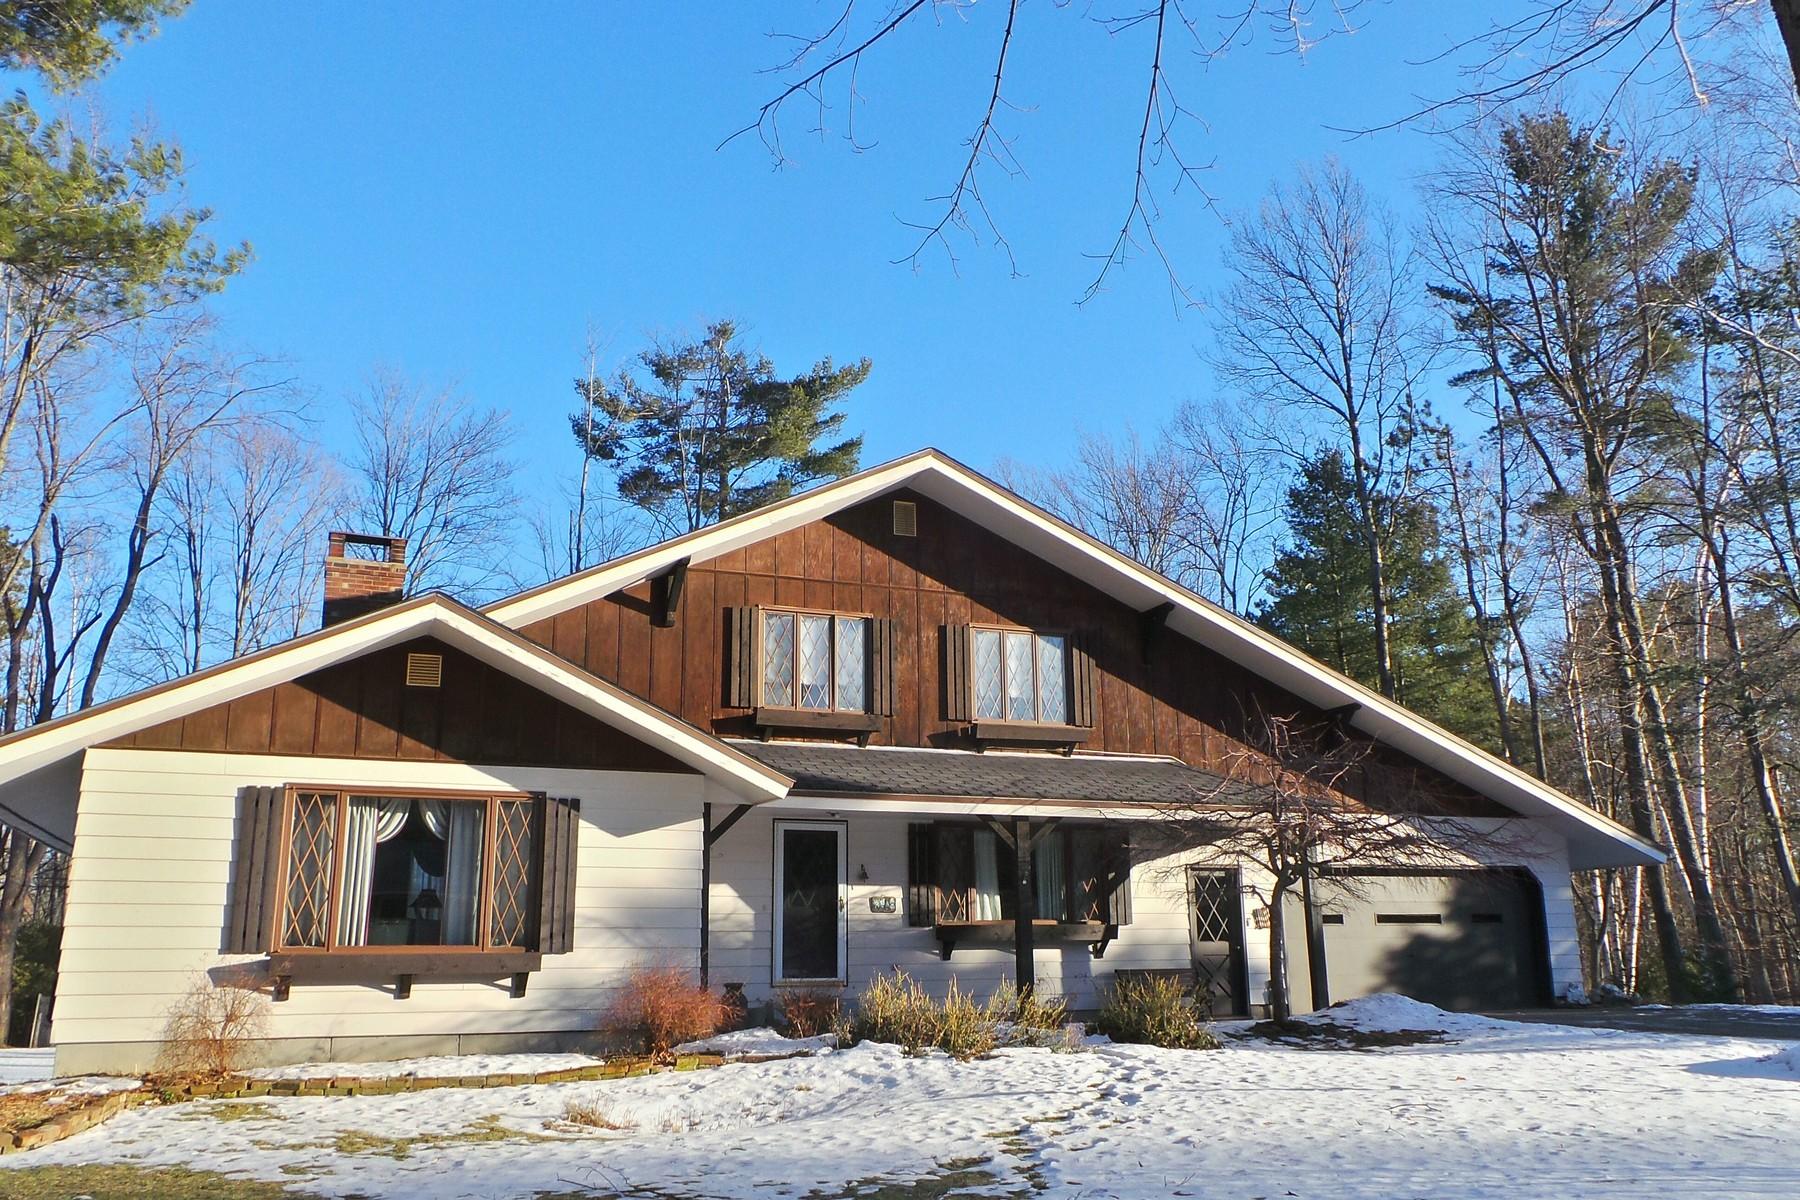 Moradia para Venda às Inviting Chalet Style Home 96 Stagecoach Newport City, Vermont, 05855 Estados Unidos